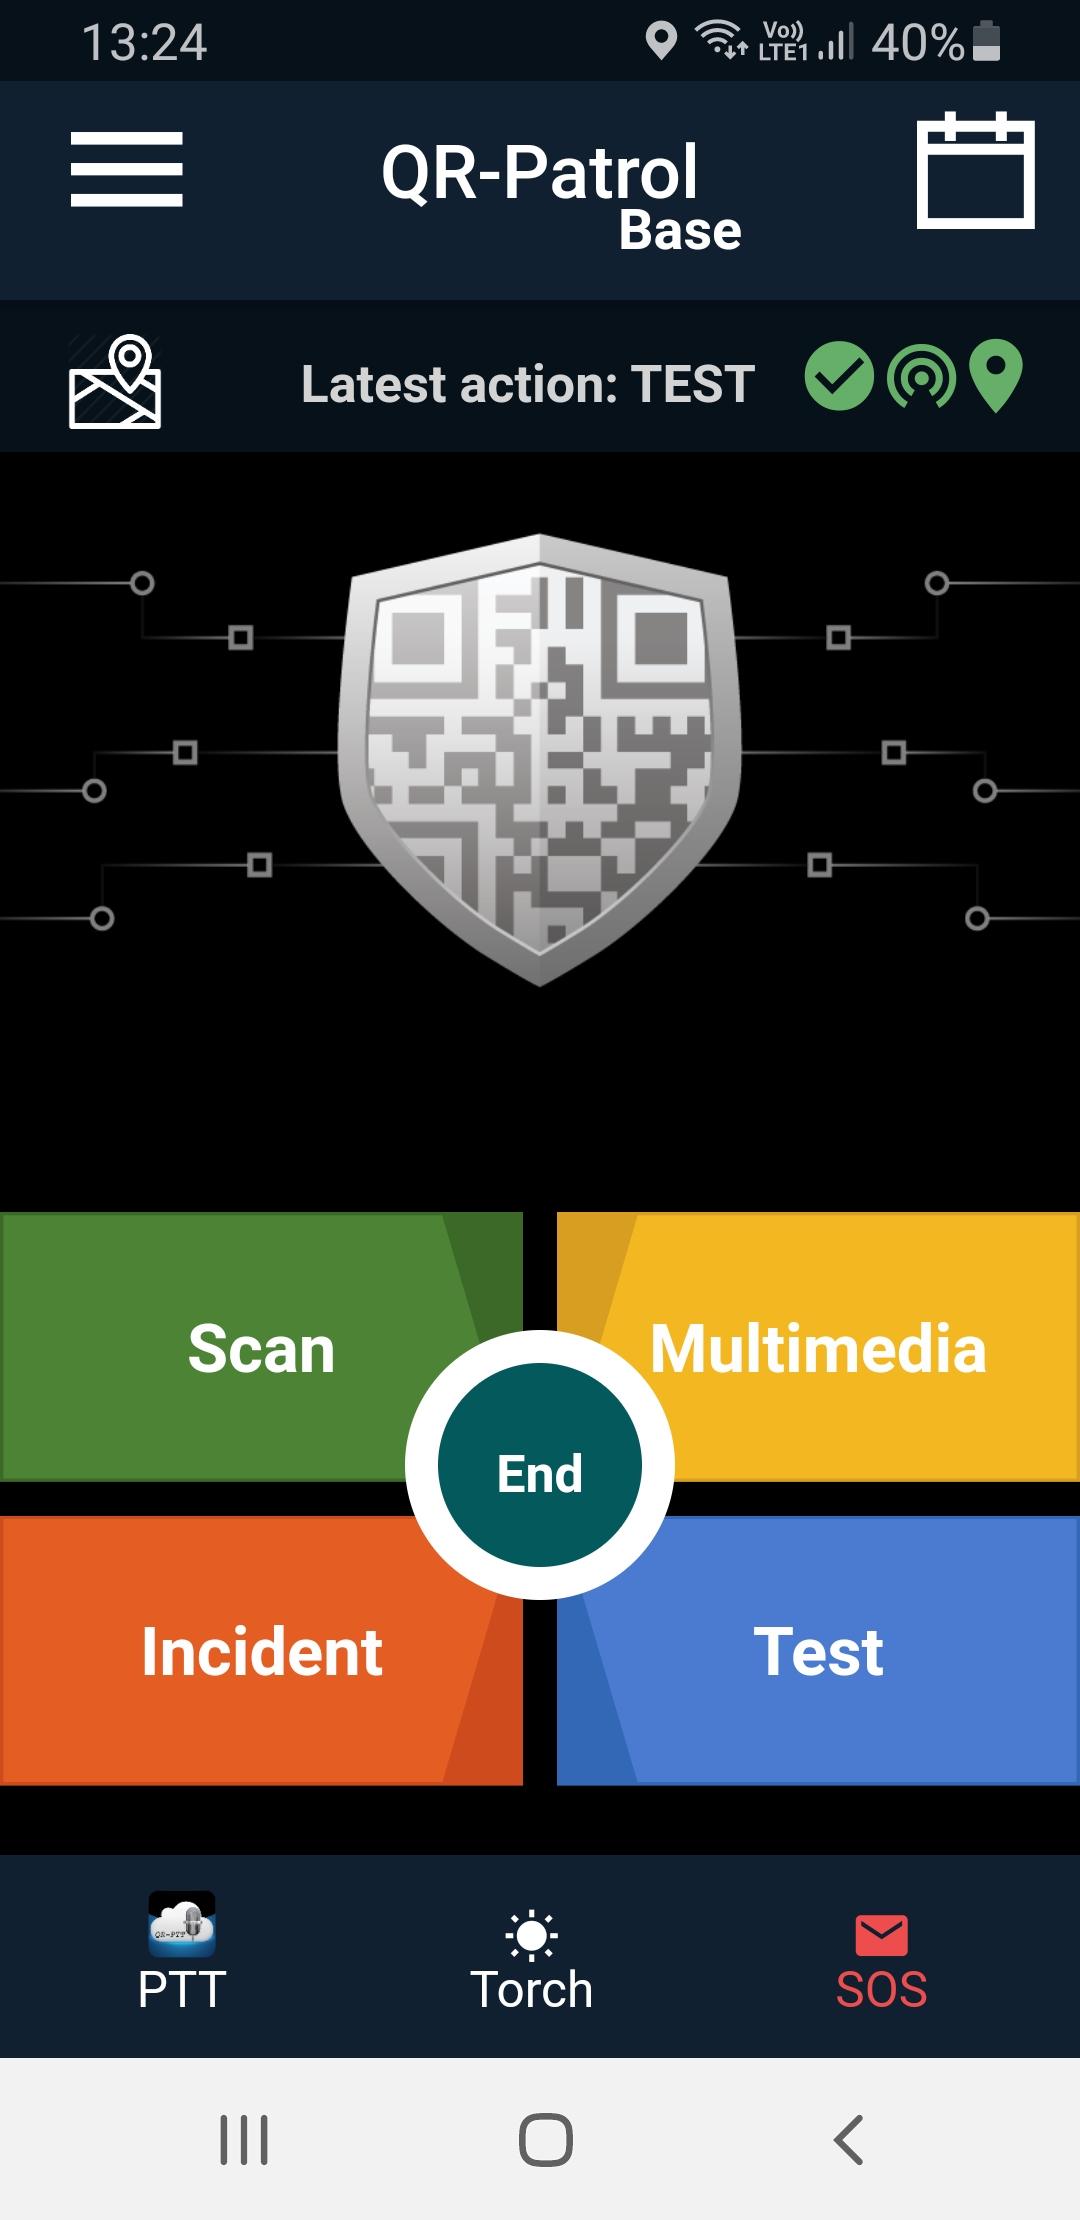 Screenshot_20200905-132452_QR-Patrol